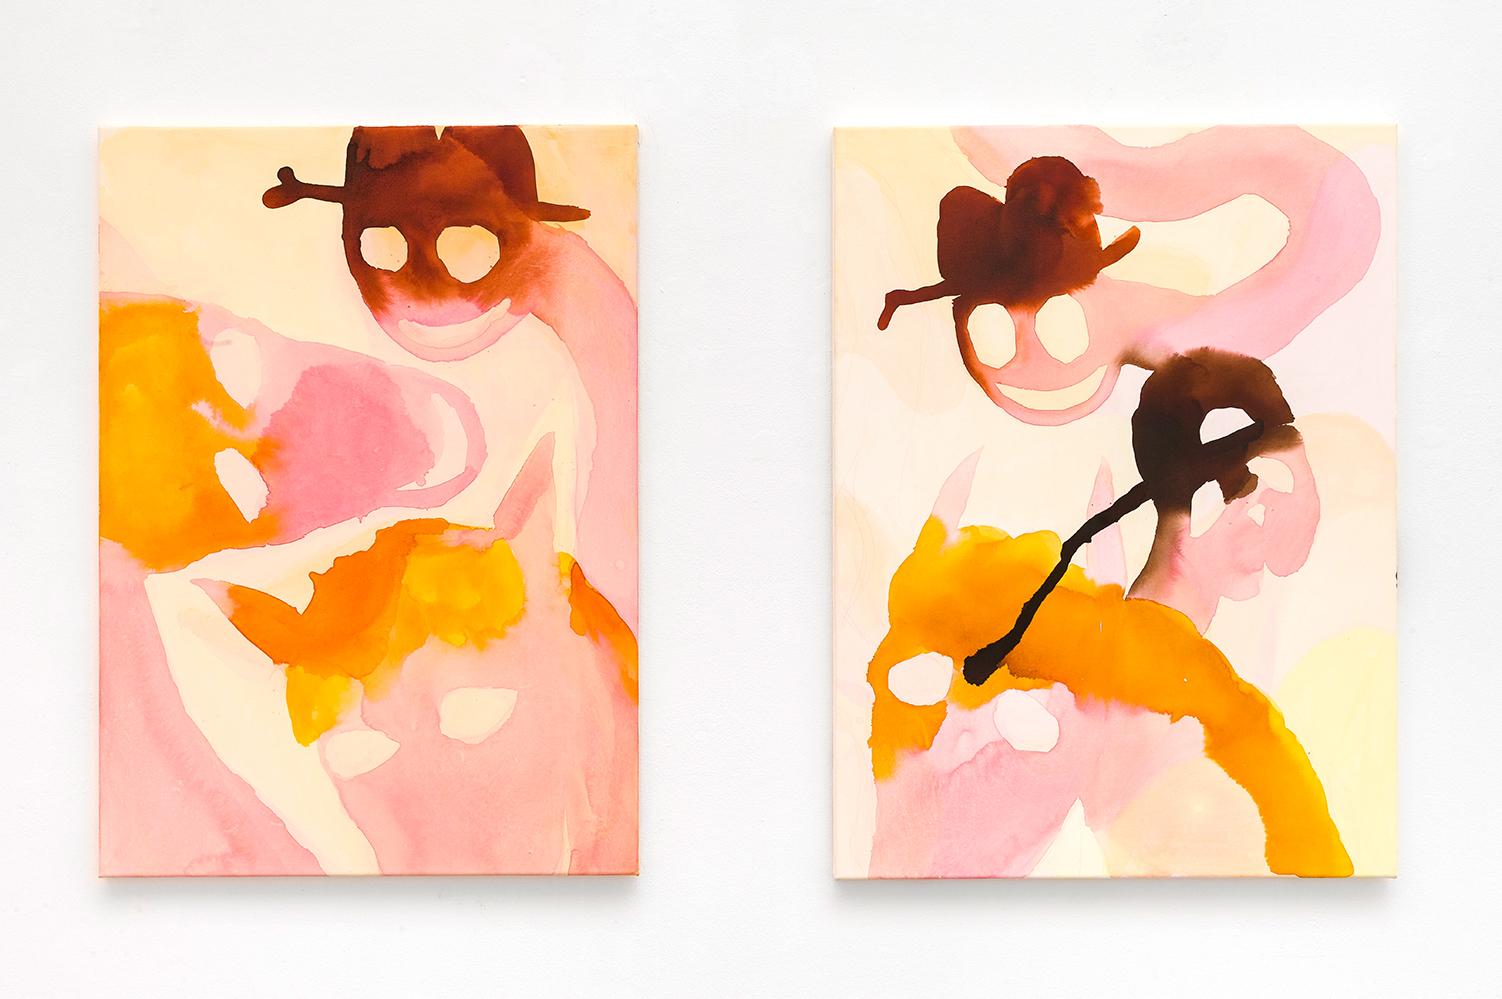 sarah bogner, pink horses, female artist